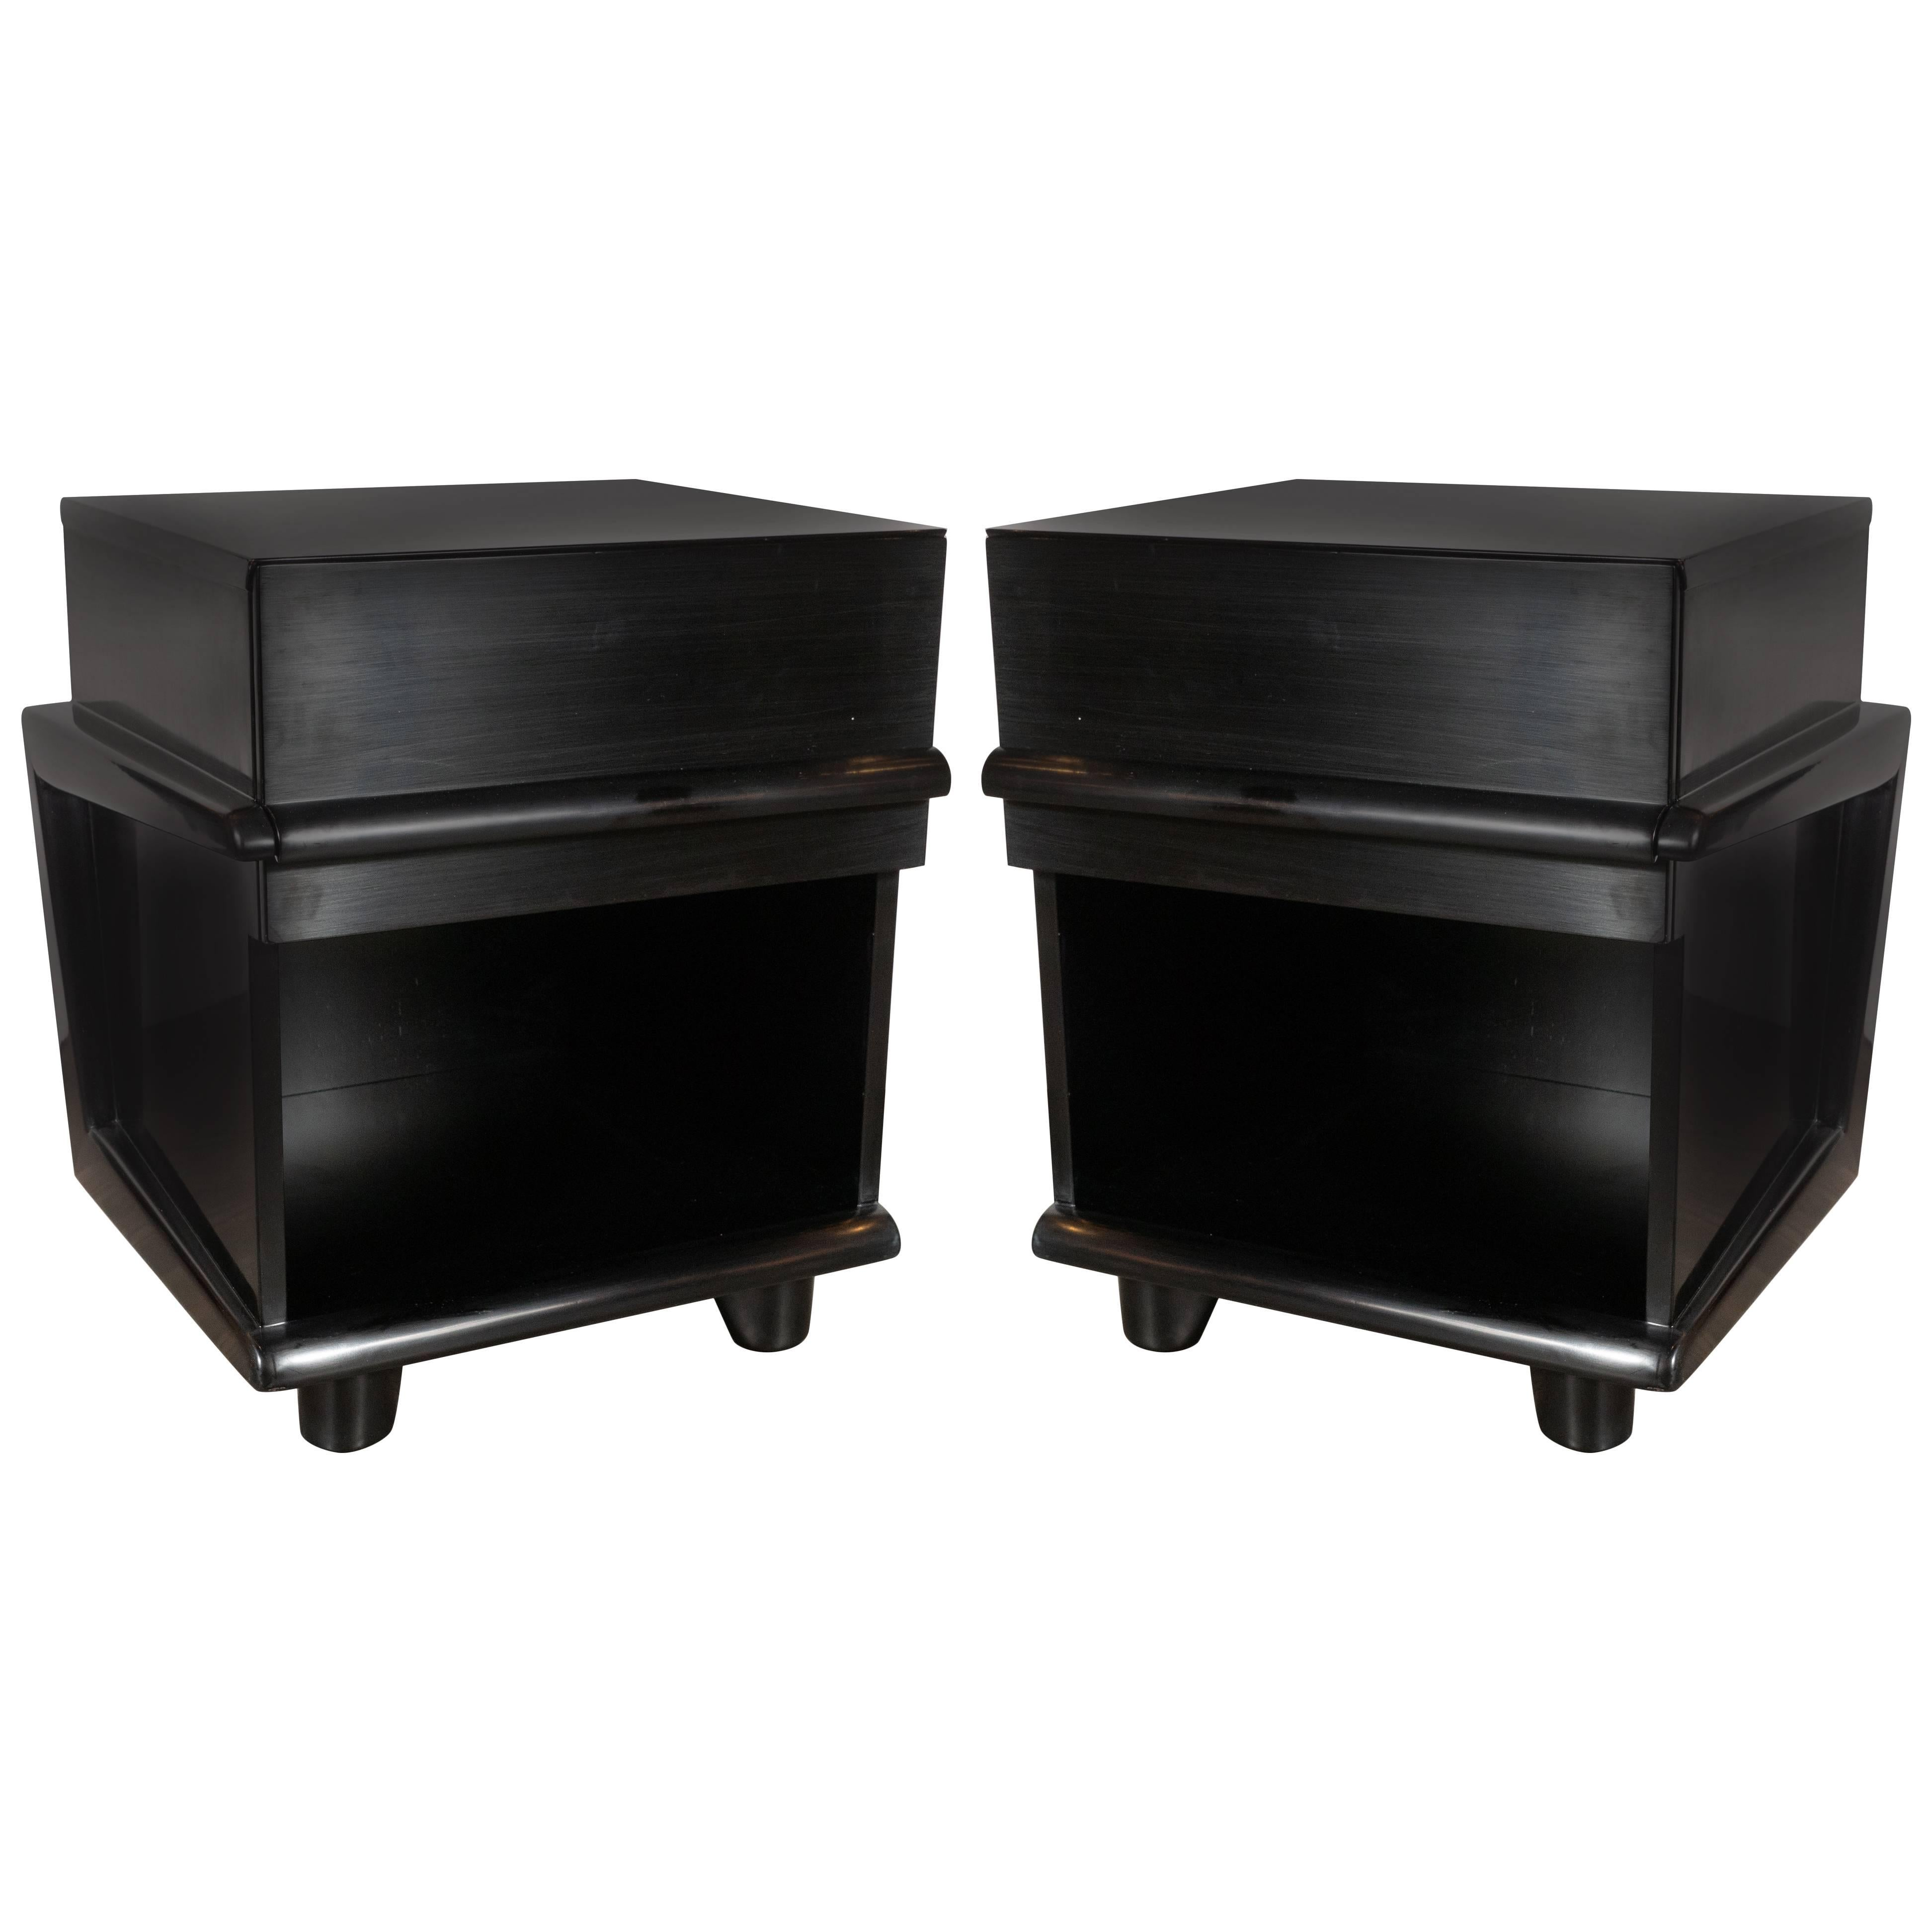 Pair of Sculptural Mid-Century Modern Ebonized Walnut Nightstands/ End Tables